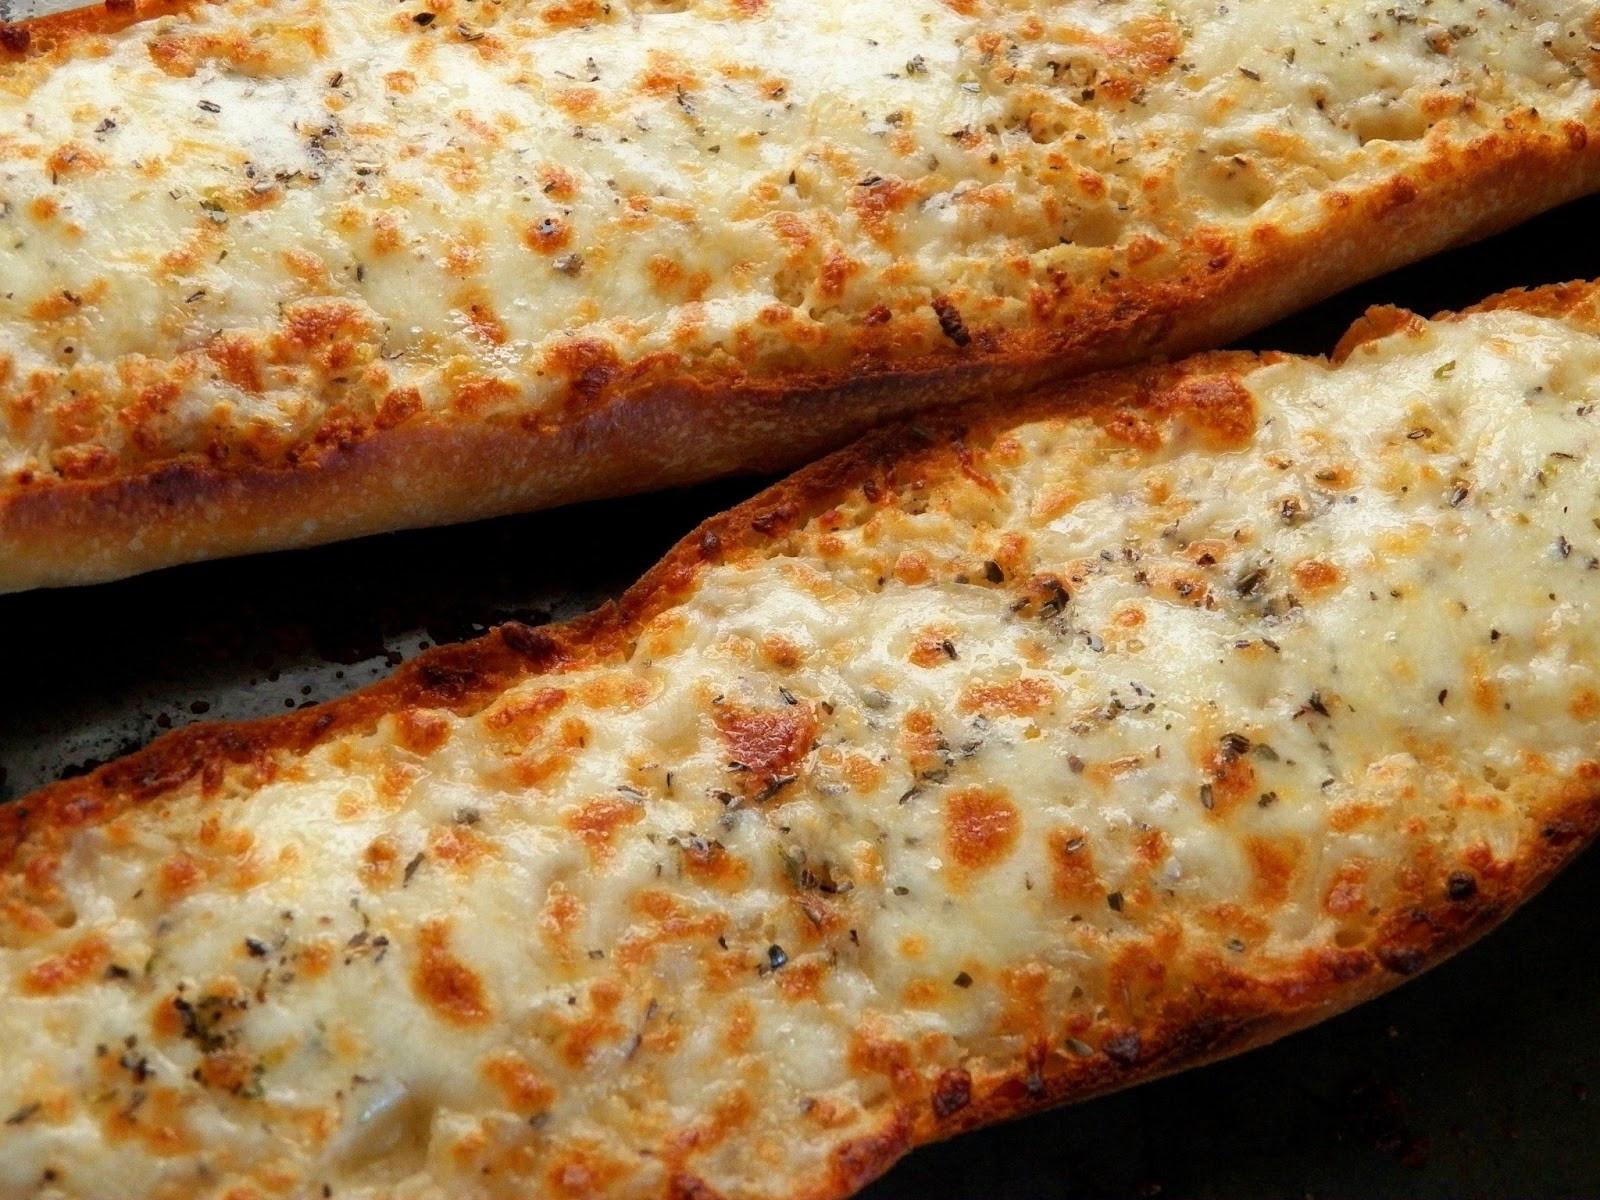 Cheesy Garlic Bread  fy Cuisine Home Recipes from Family & Friends Cheesy